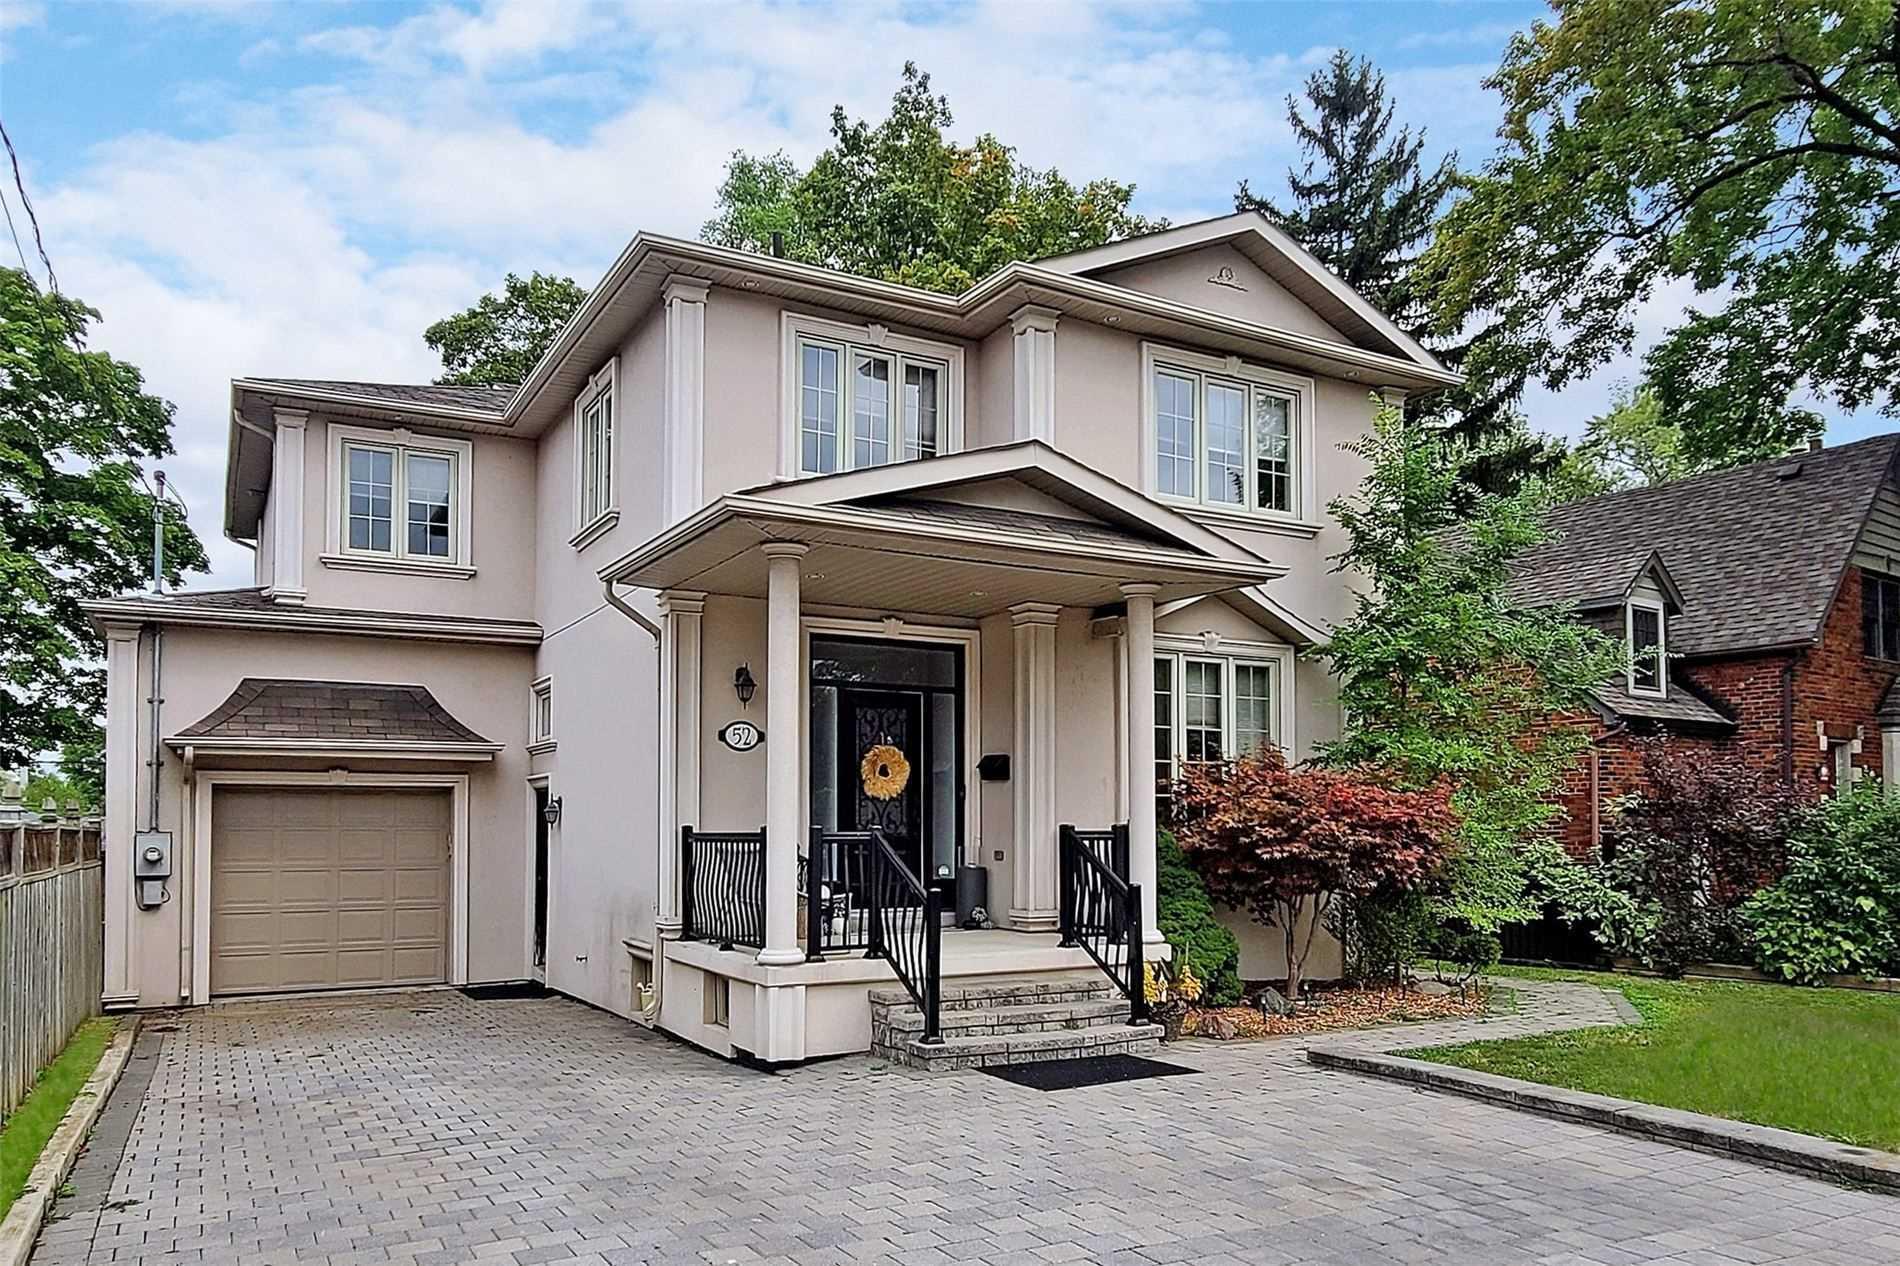 52 Pelmo Cres, Toronto, Ontario M9N2X5, 4 Bedrooms Bedrooms, 10 Rooms Rooms,4 BathroomsBathrooms,Detached,For Sale,Pelmo,W5374363